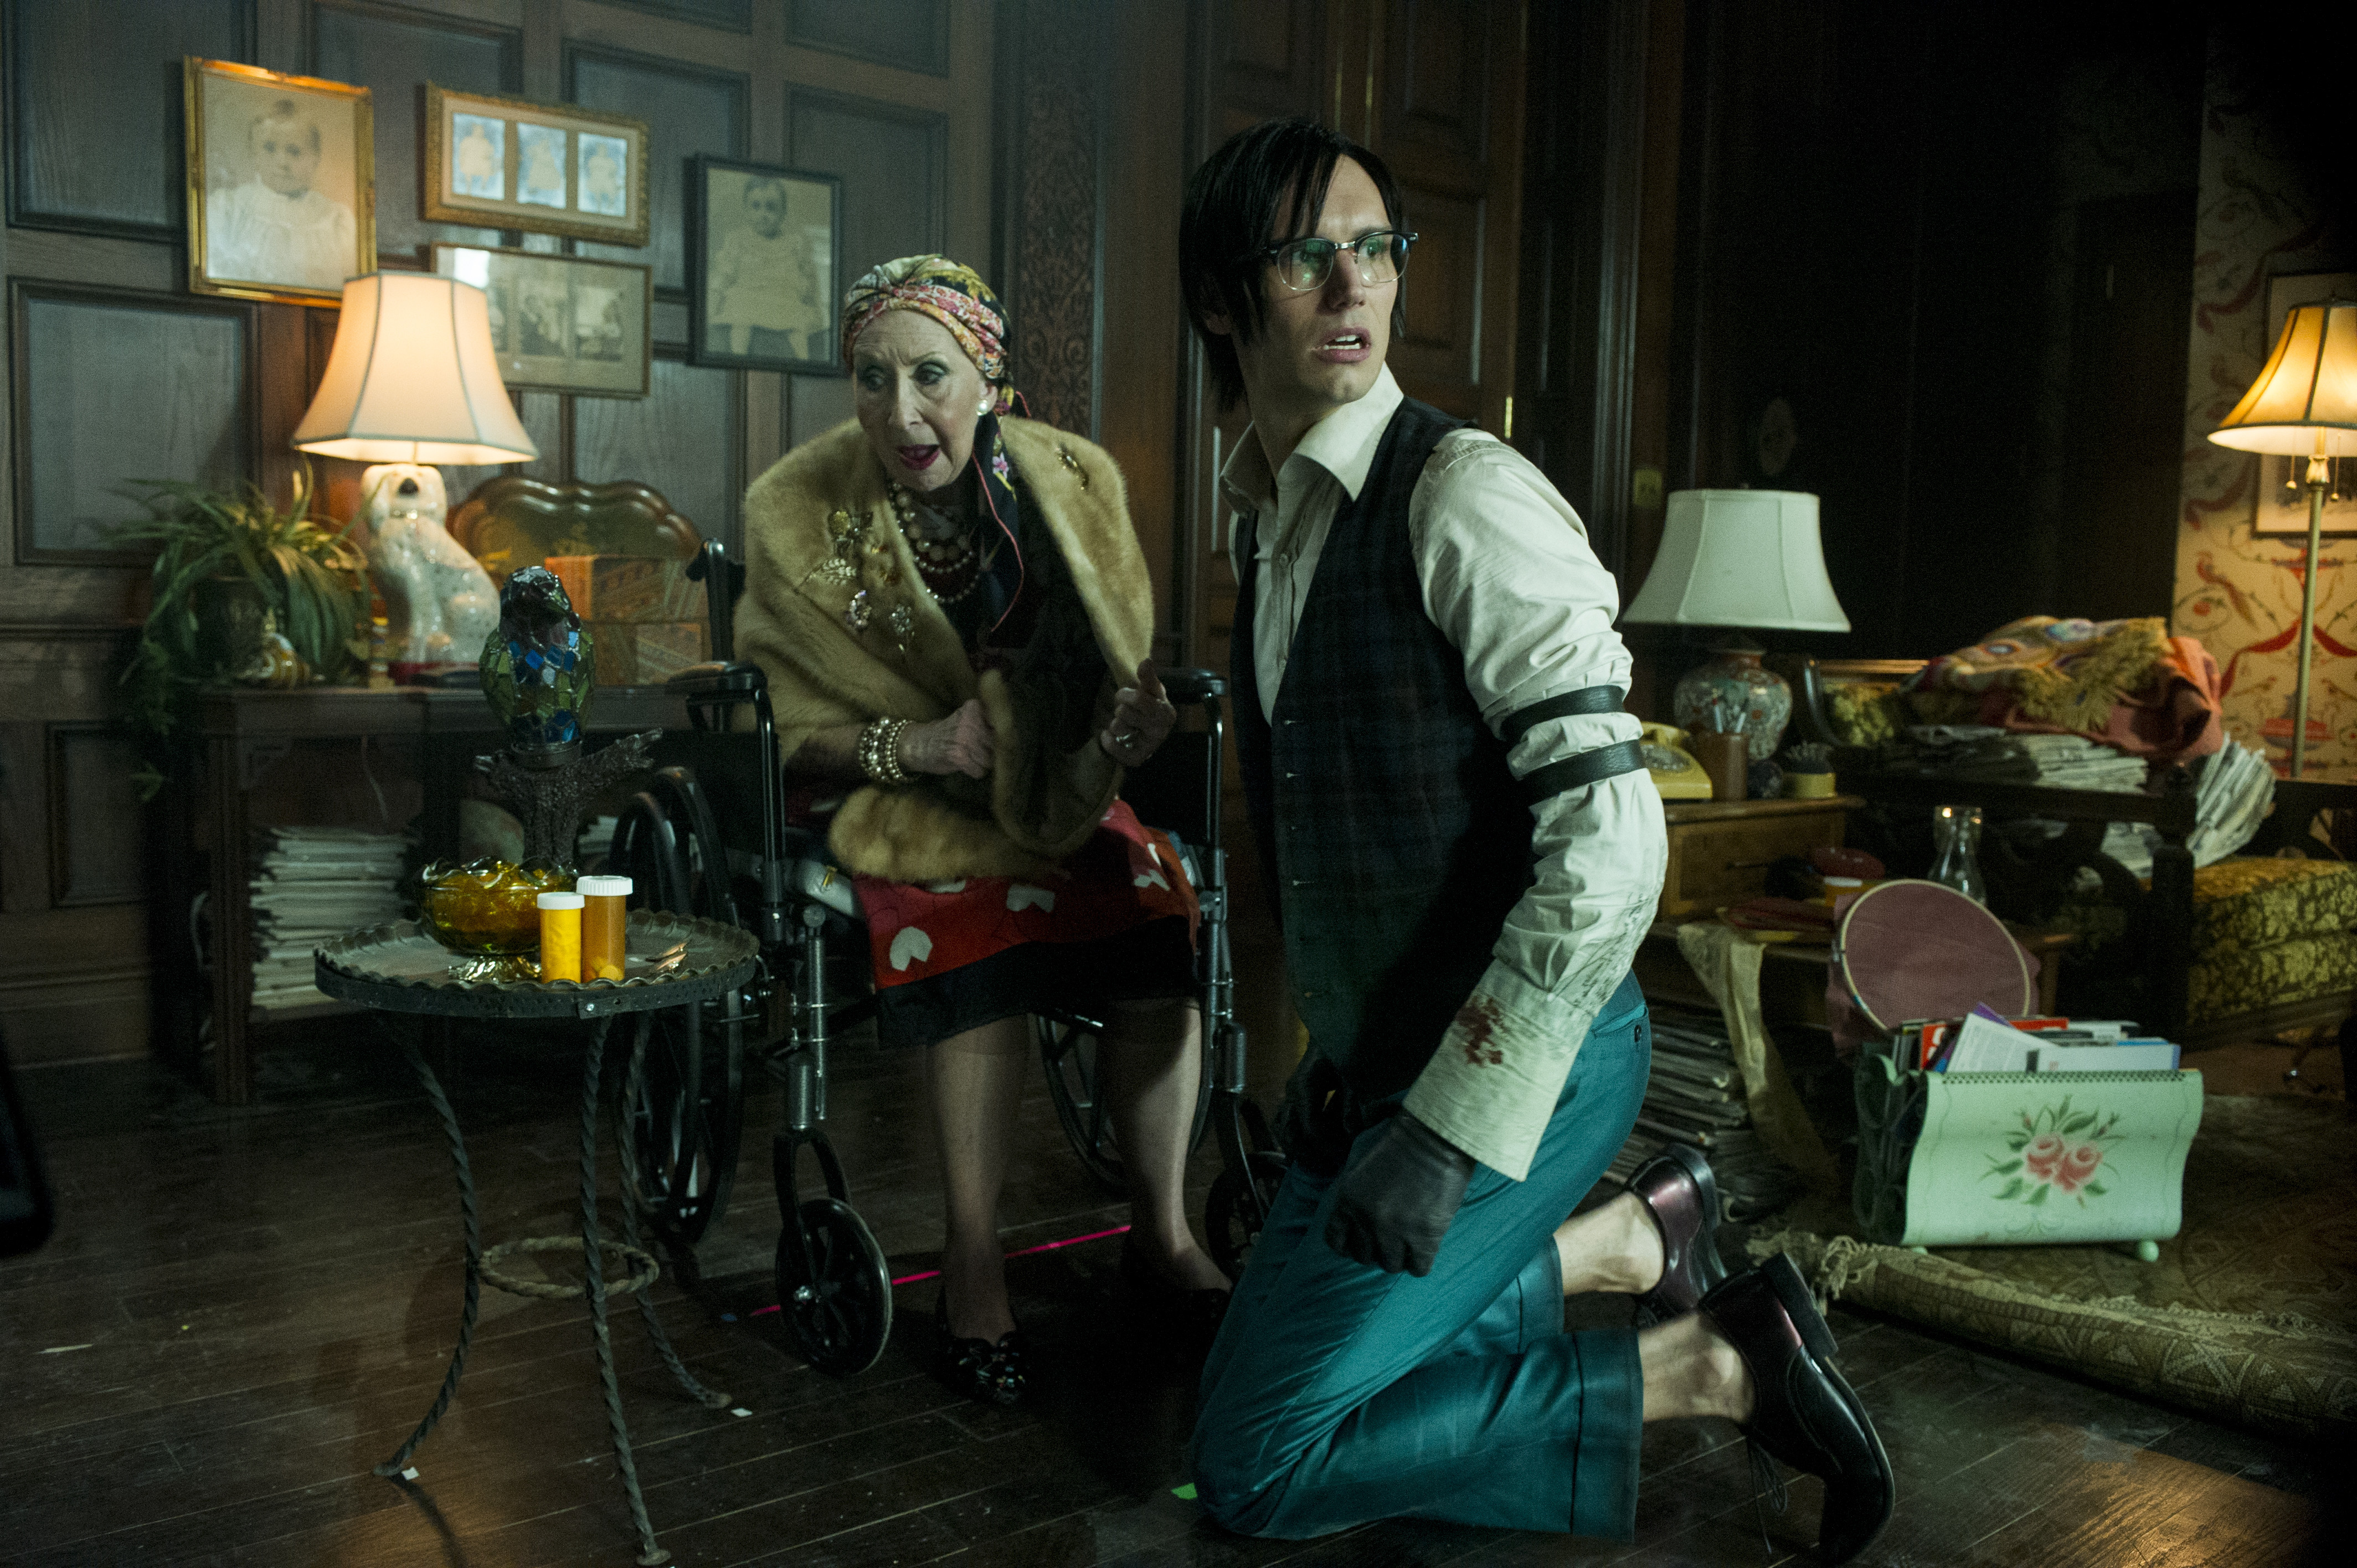 Gotham season 5, episodes 4 & 5 recap: Who destroyed Haven